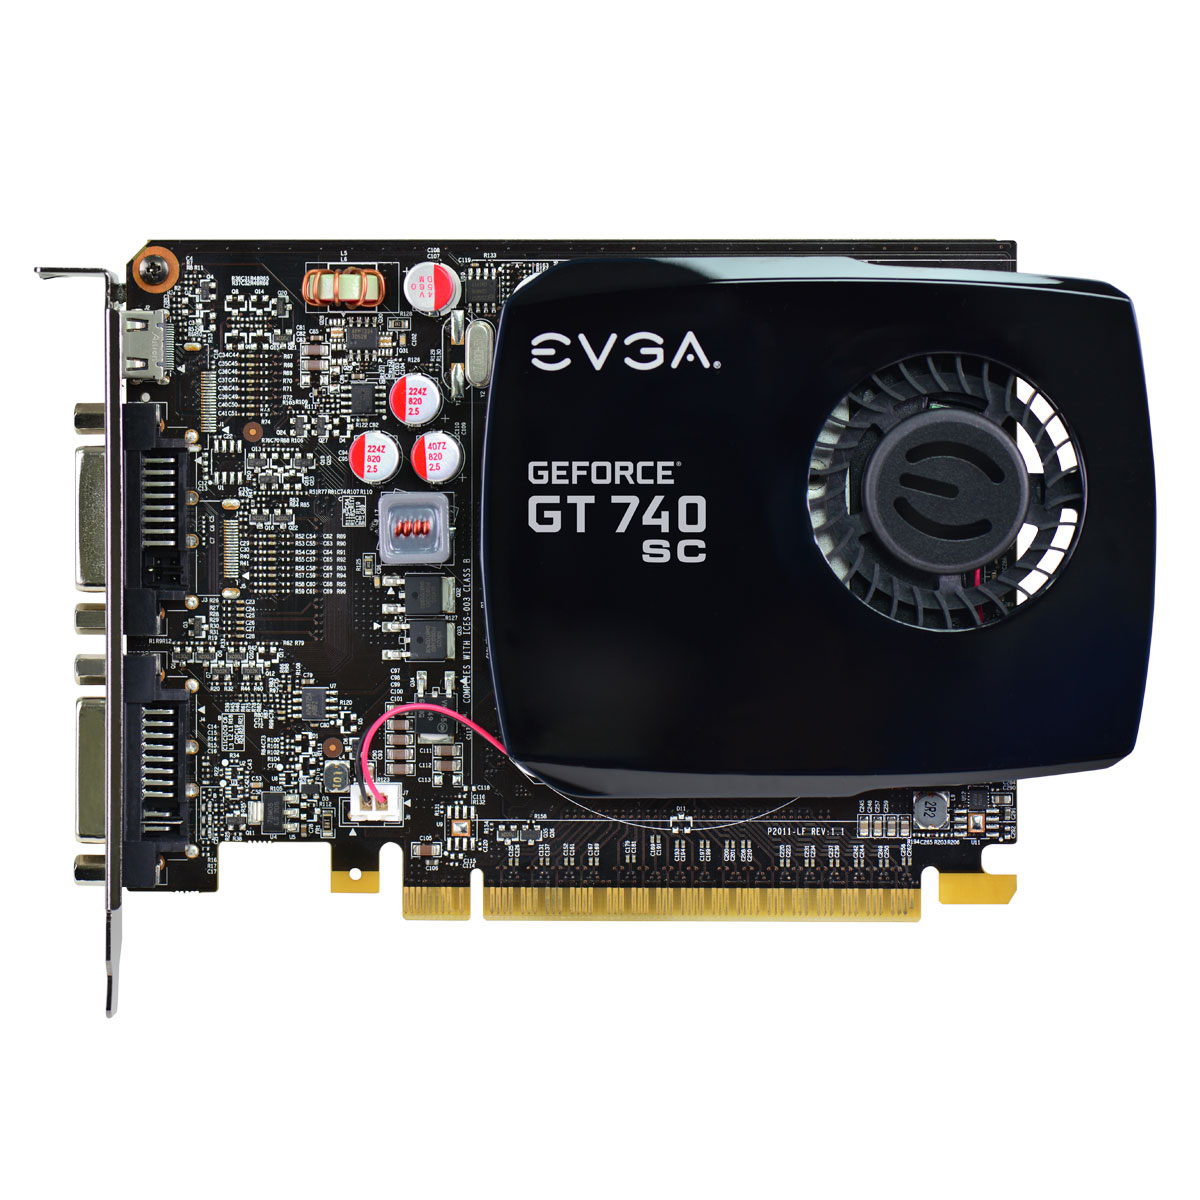 Placa de Vídeo Geforce GT740 2GB DDr3 128Bits 02G-P4-2742-KR - EVGA